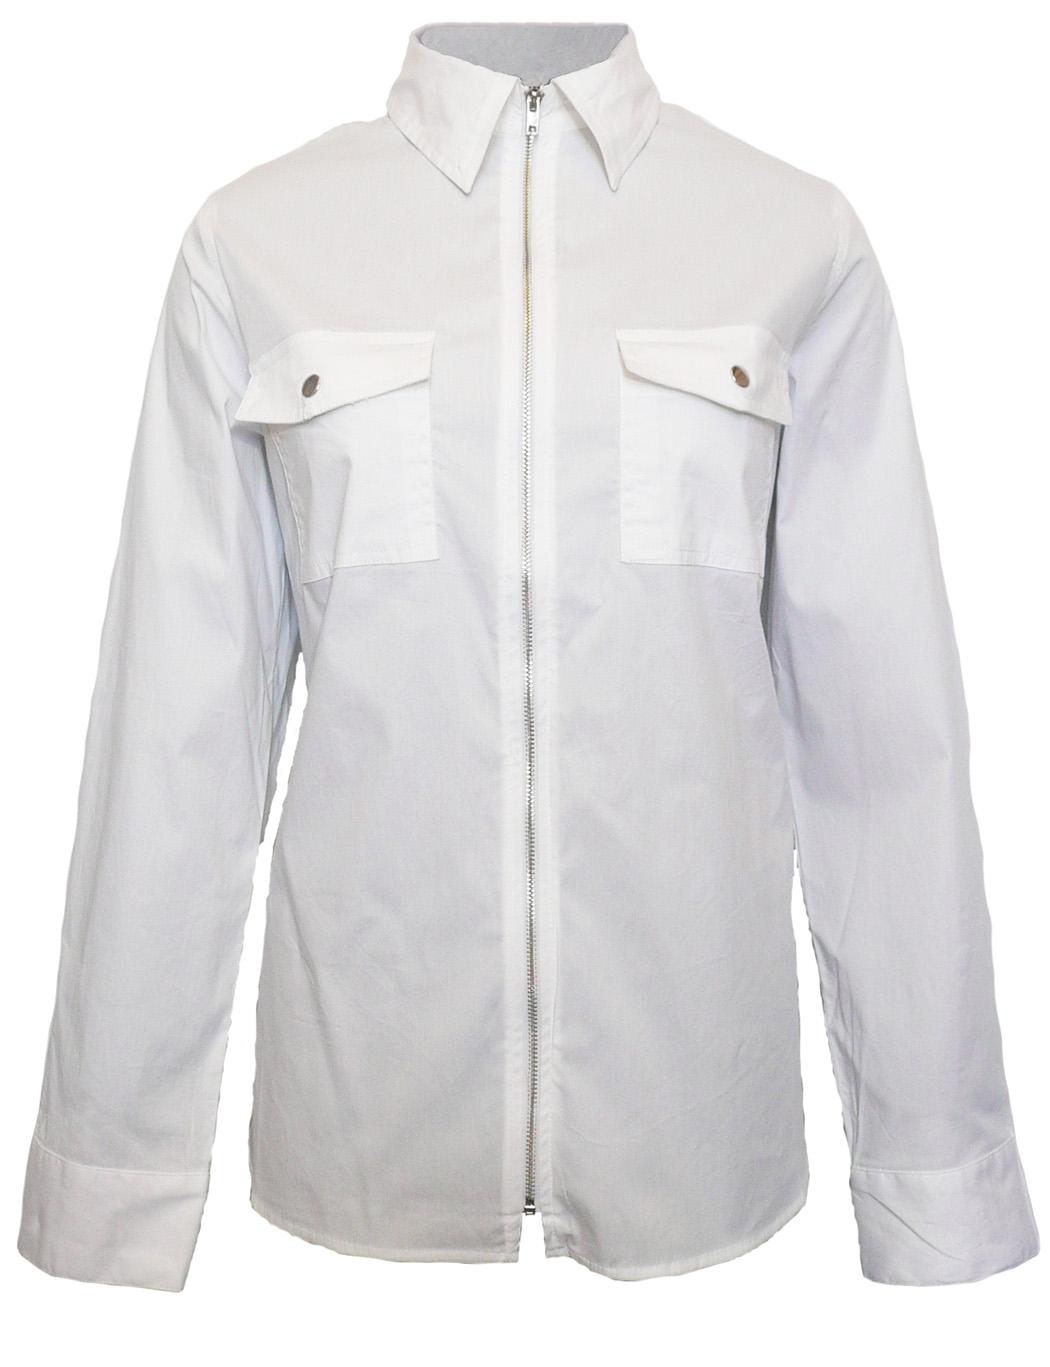 Shirt_WhitePocket_Front.jpg